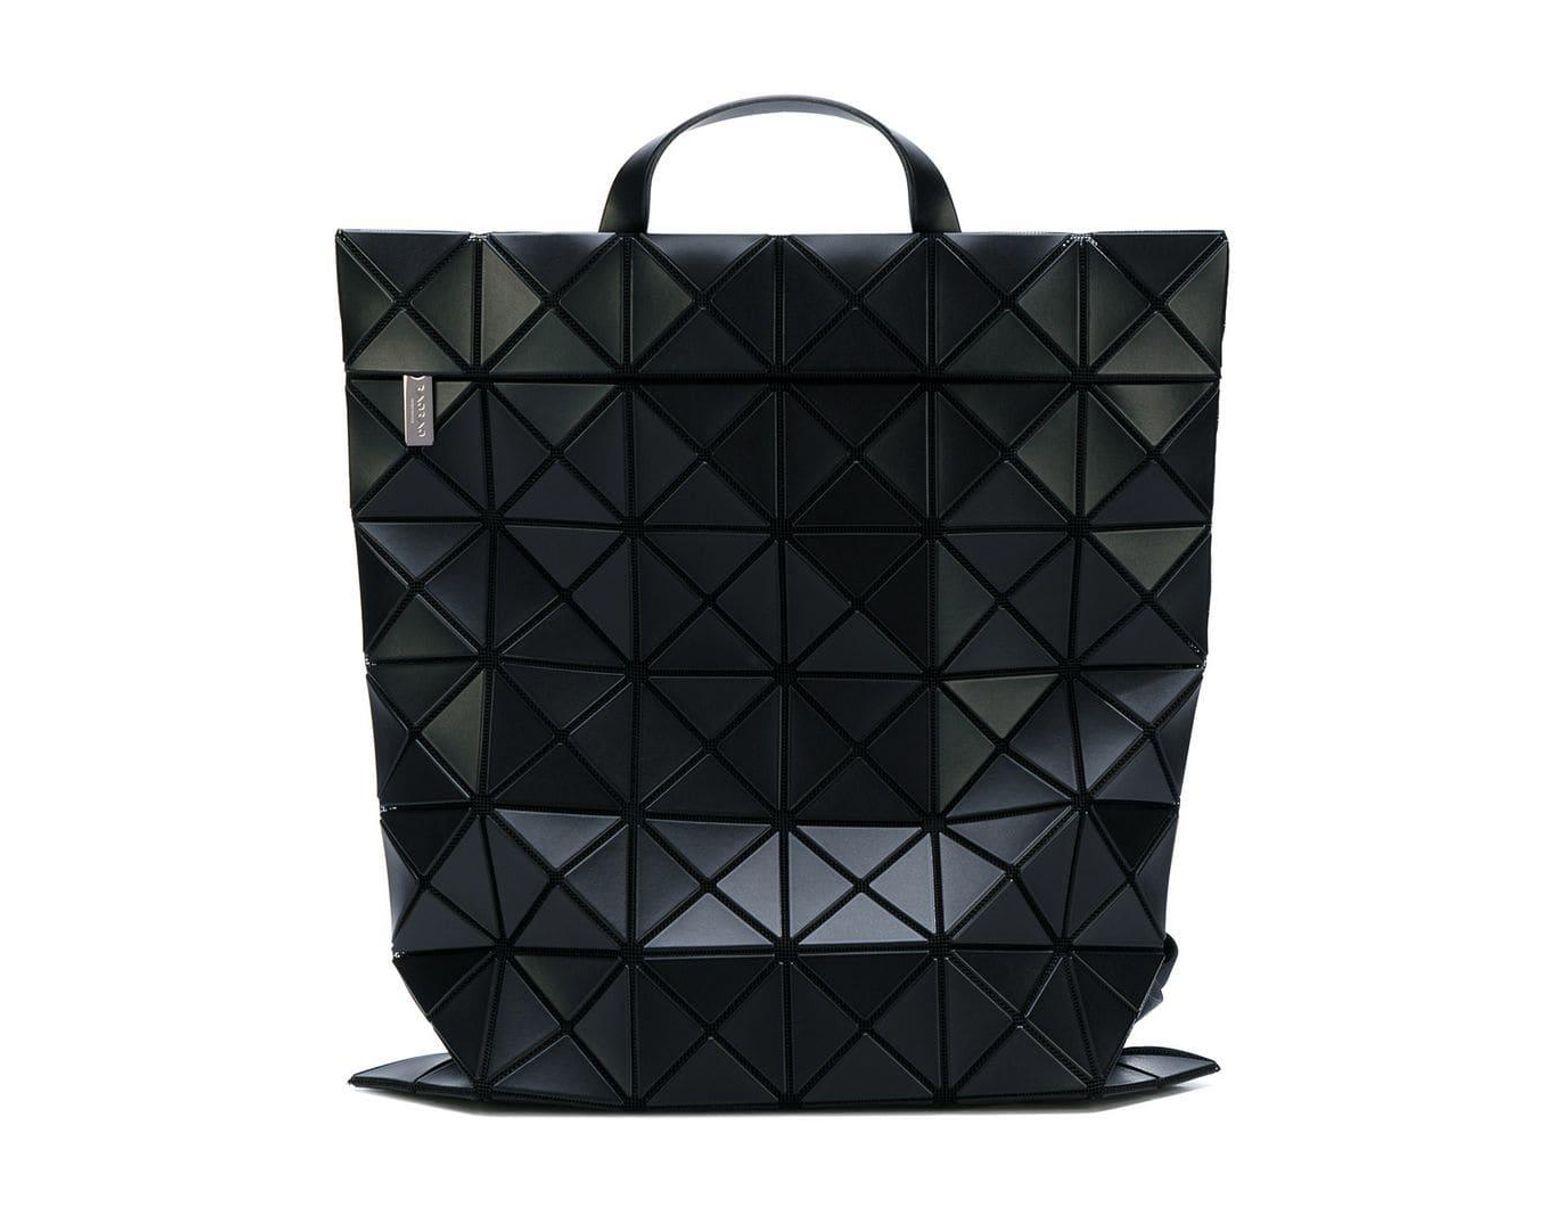 7624664b365 Mochila Flat Pack Bao Bao Issey Miyake de color Negro - Lyst